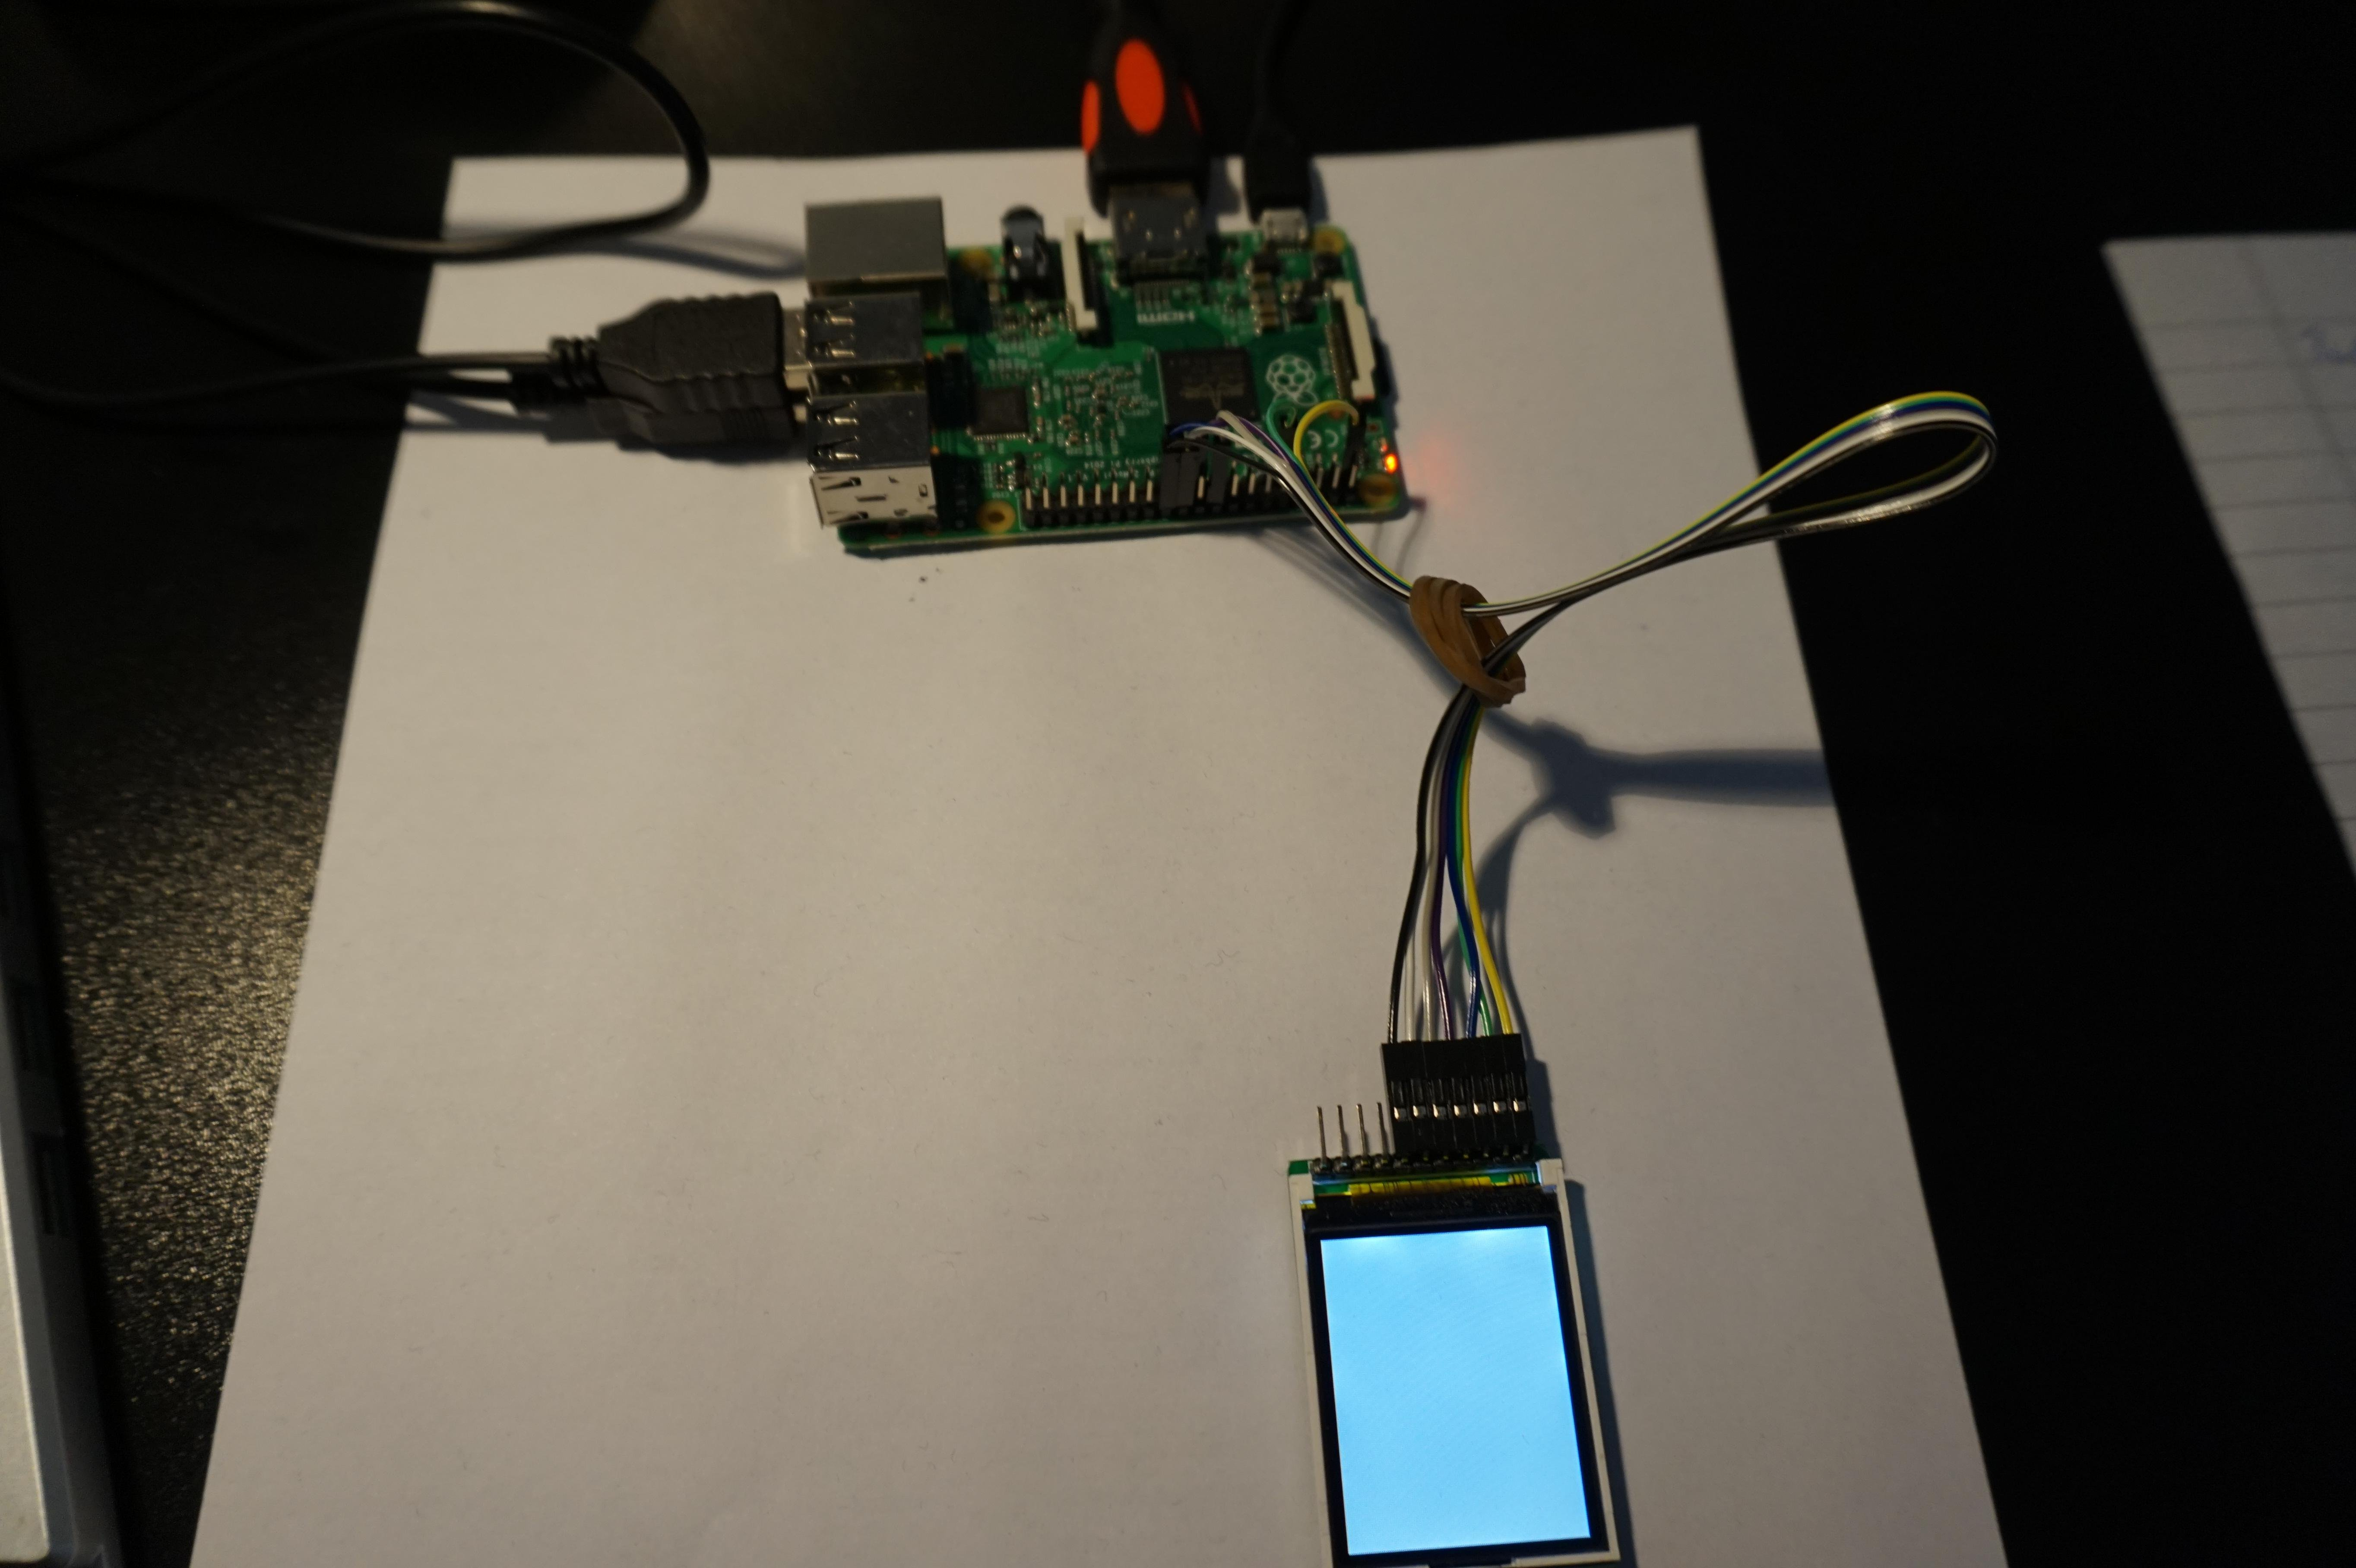 Raspberry pi downloading updates please wait